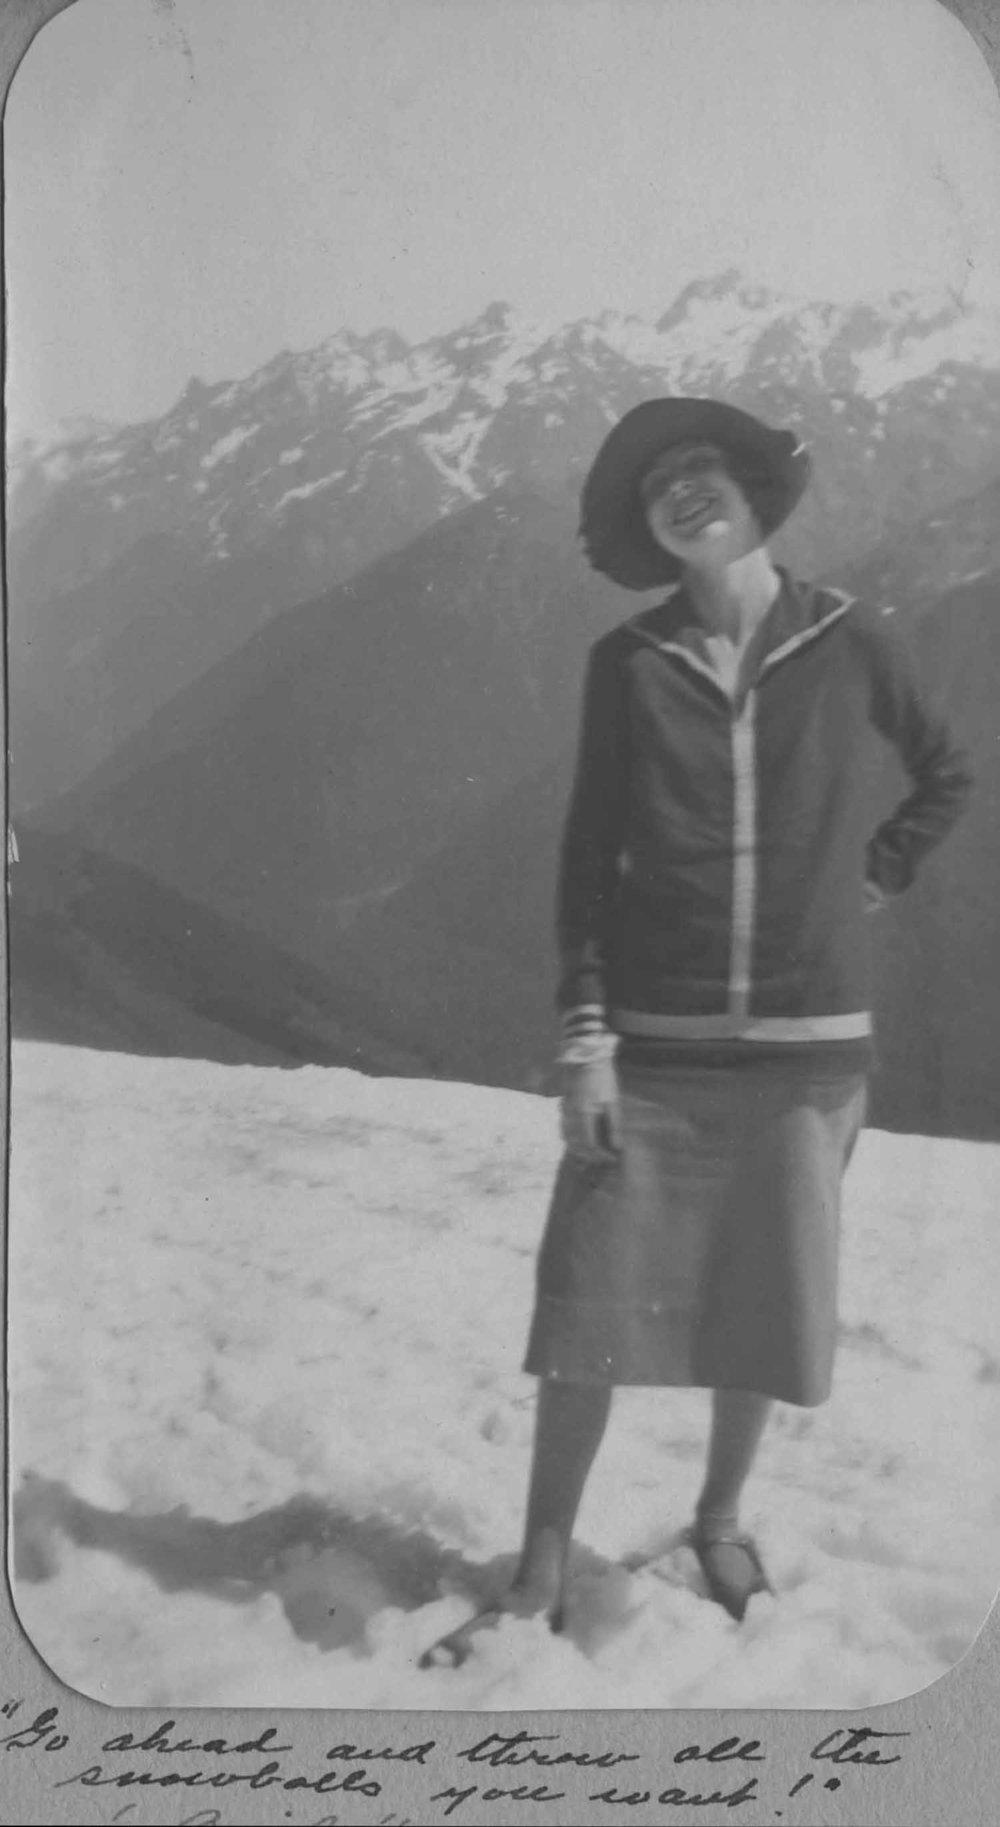 Anais 1927 6 Apr Pyranees.jpg